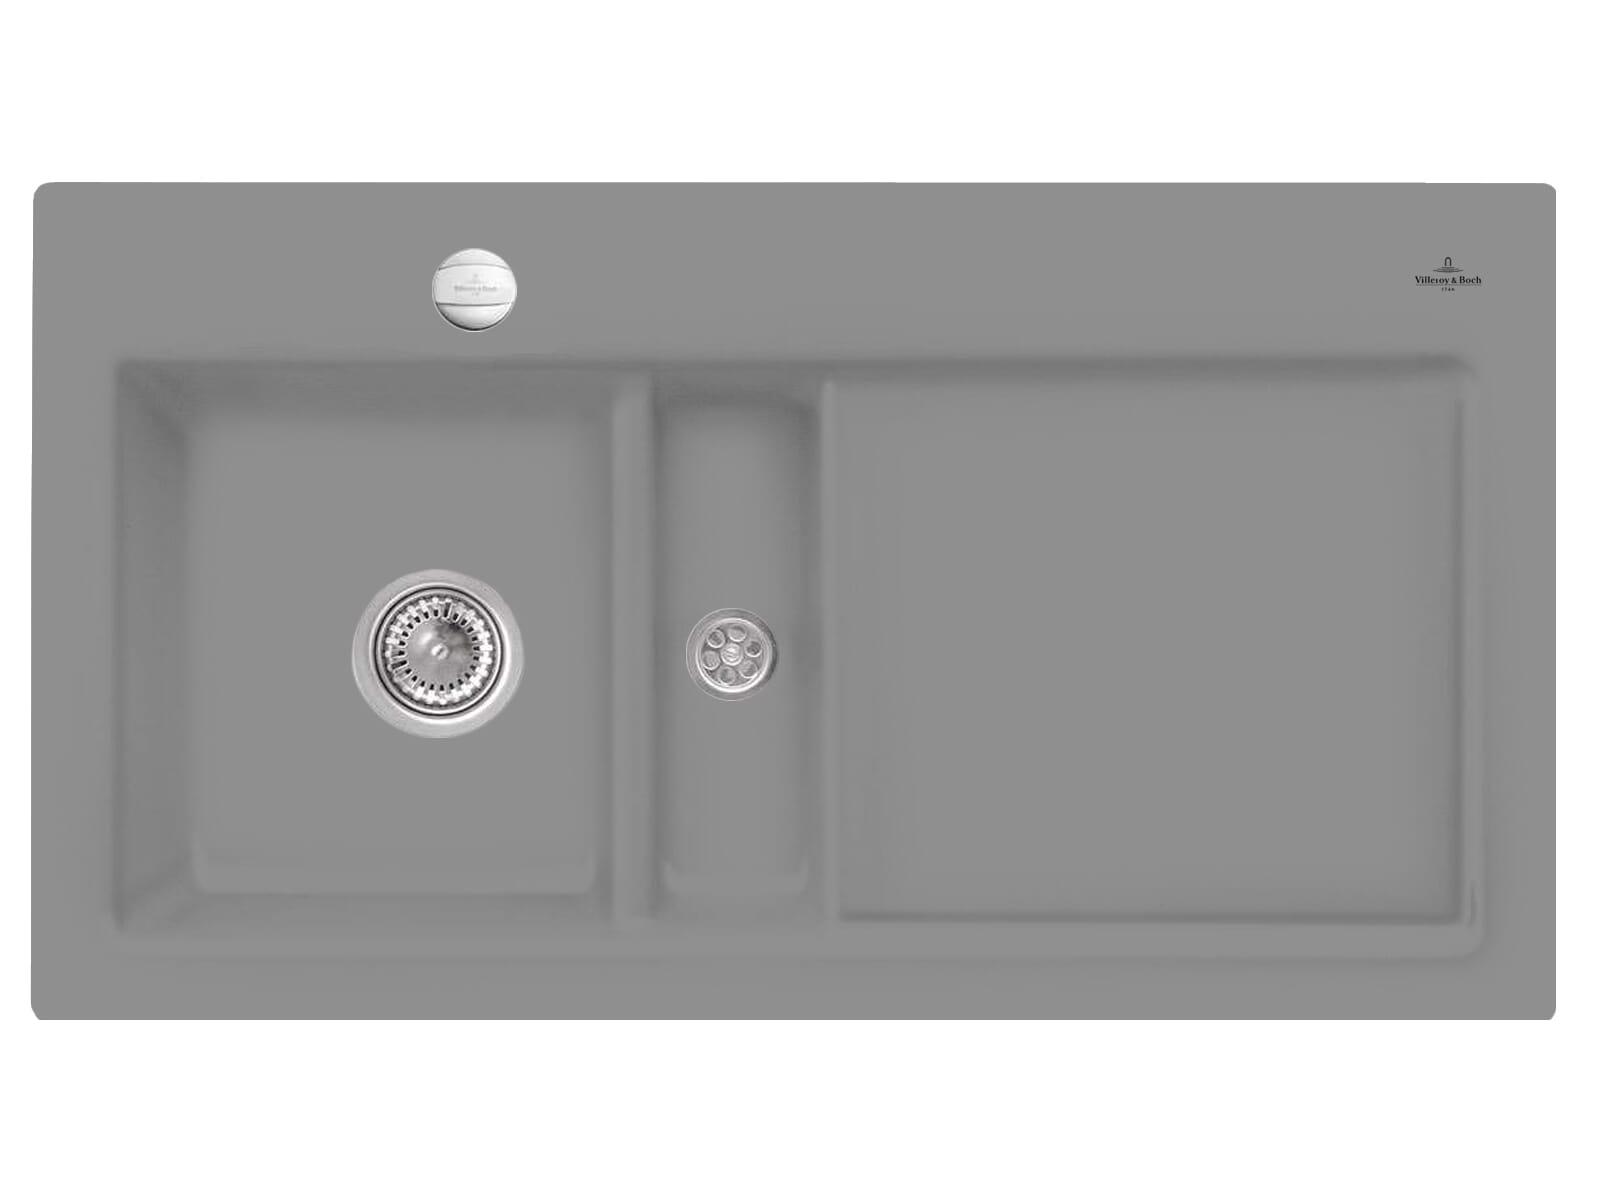 Villeroy & Boch Subway 50 Stone - 6773 02 SL Keramikspüle Exzenterbetätigung